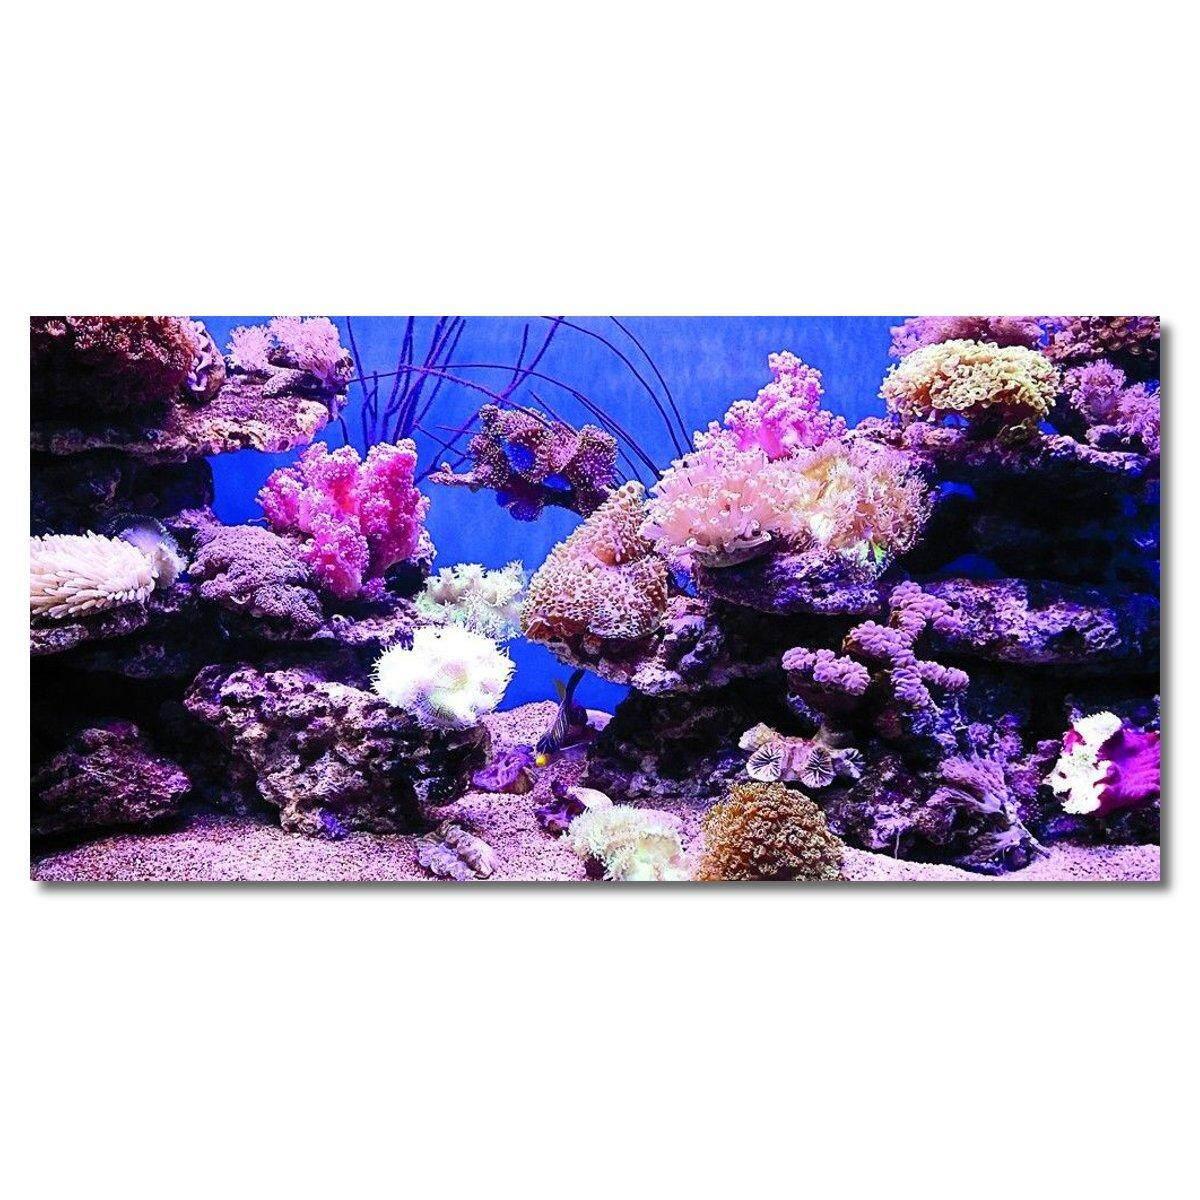 Coral HD Aquarium โปสเตอร์พื้นหลังตู้ปลาตกแต่ง Self Adhesive #122x61 เซนติเมตร - INTL